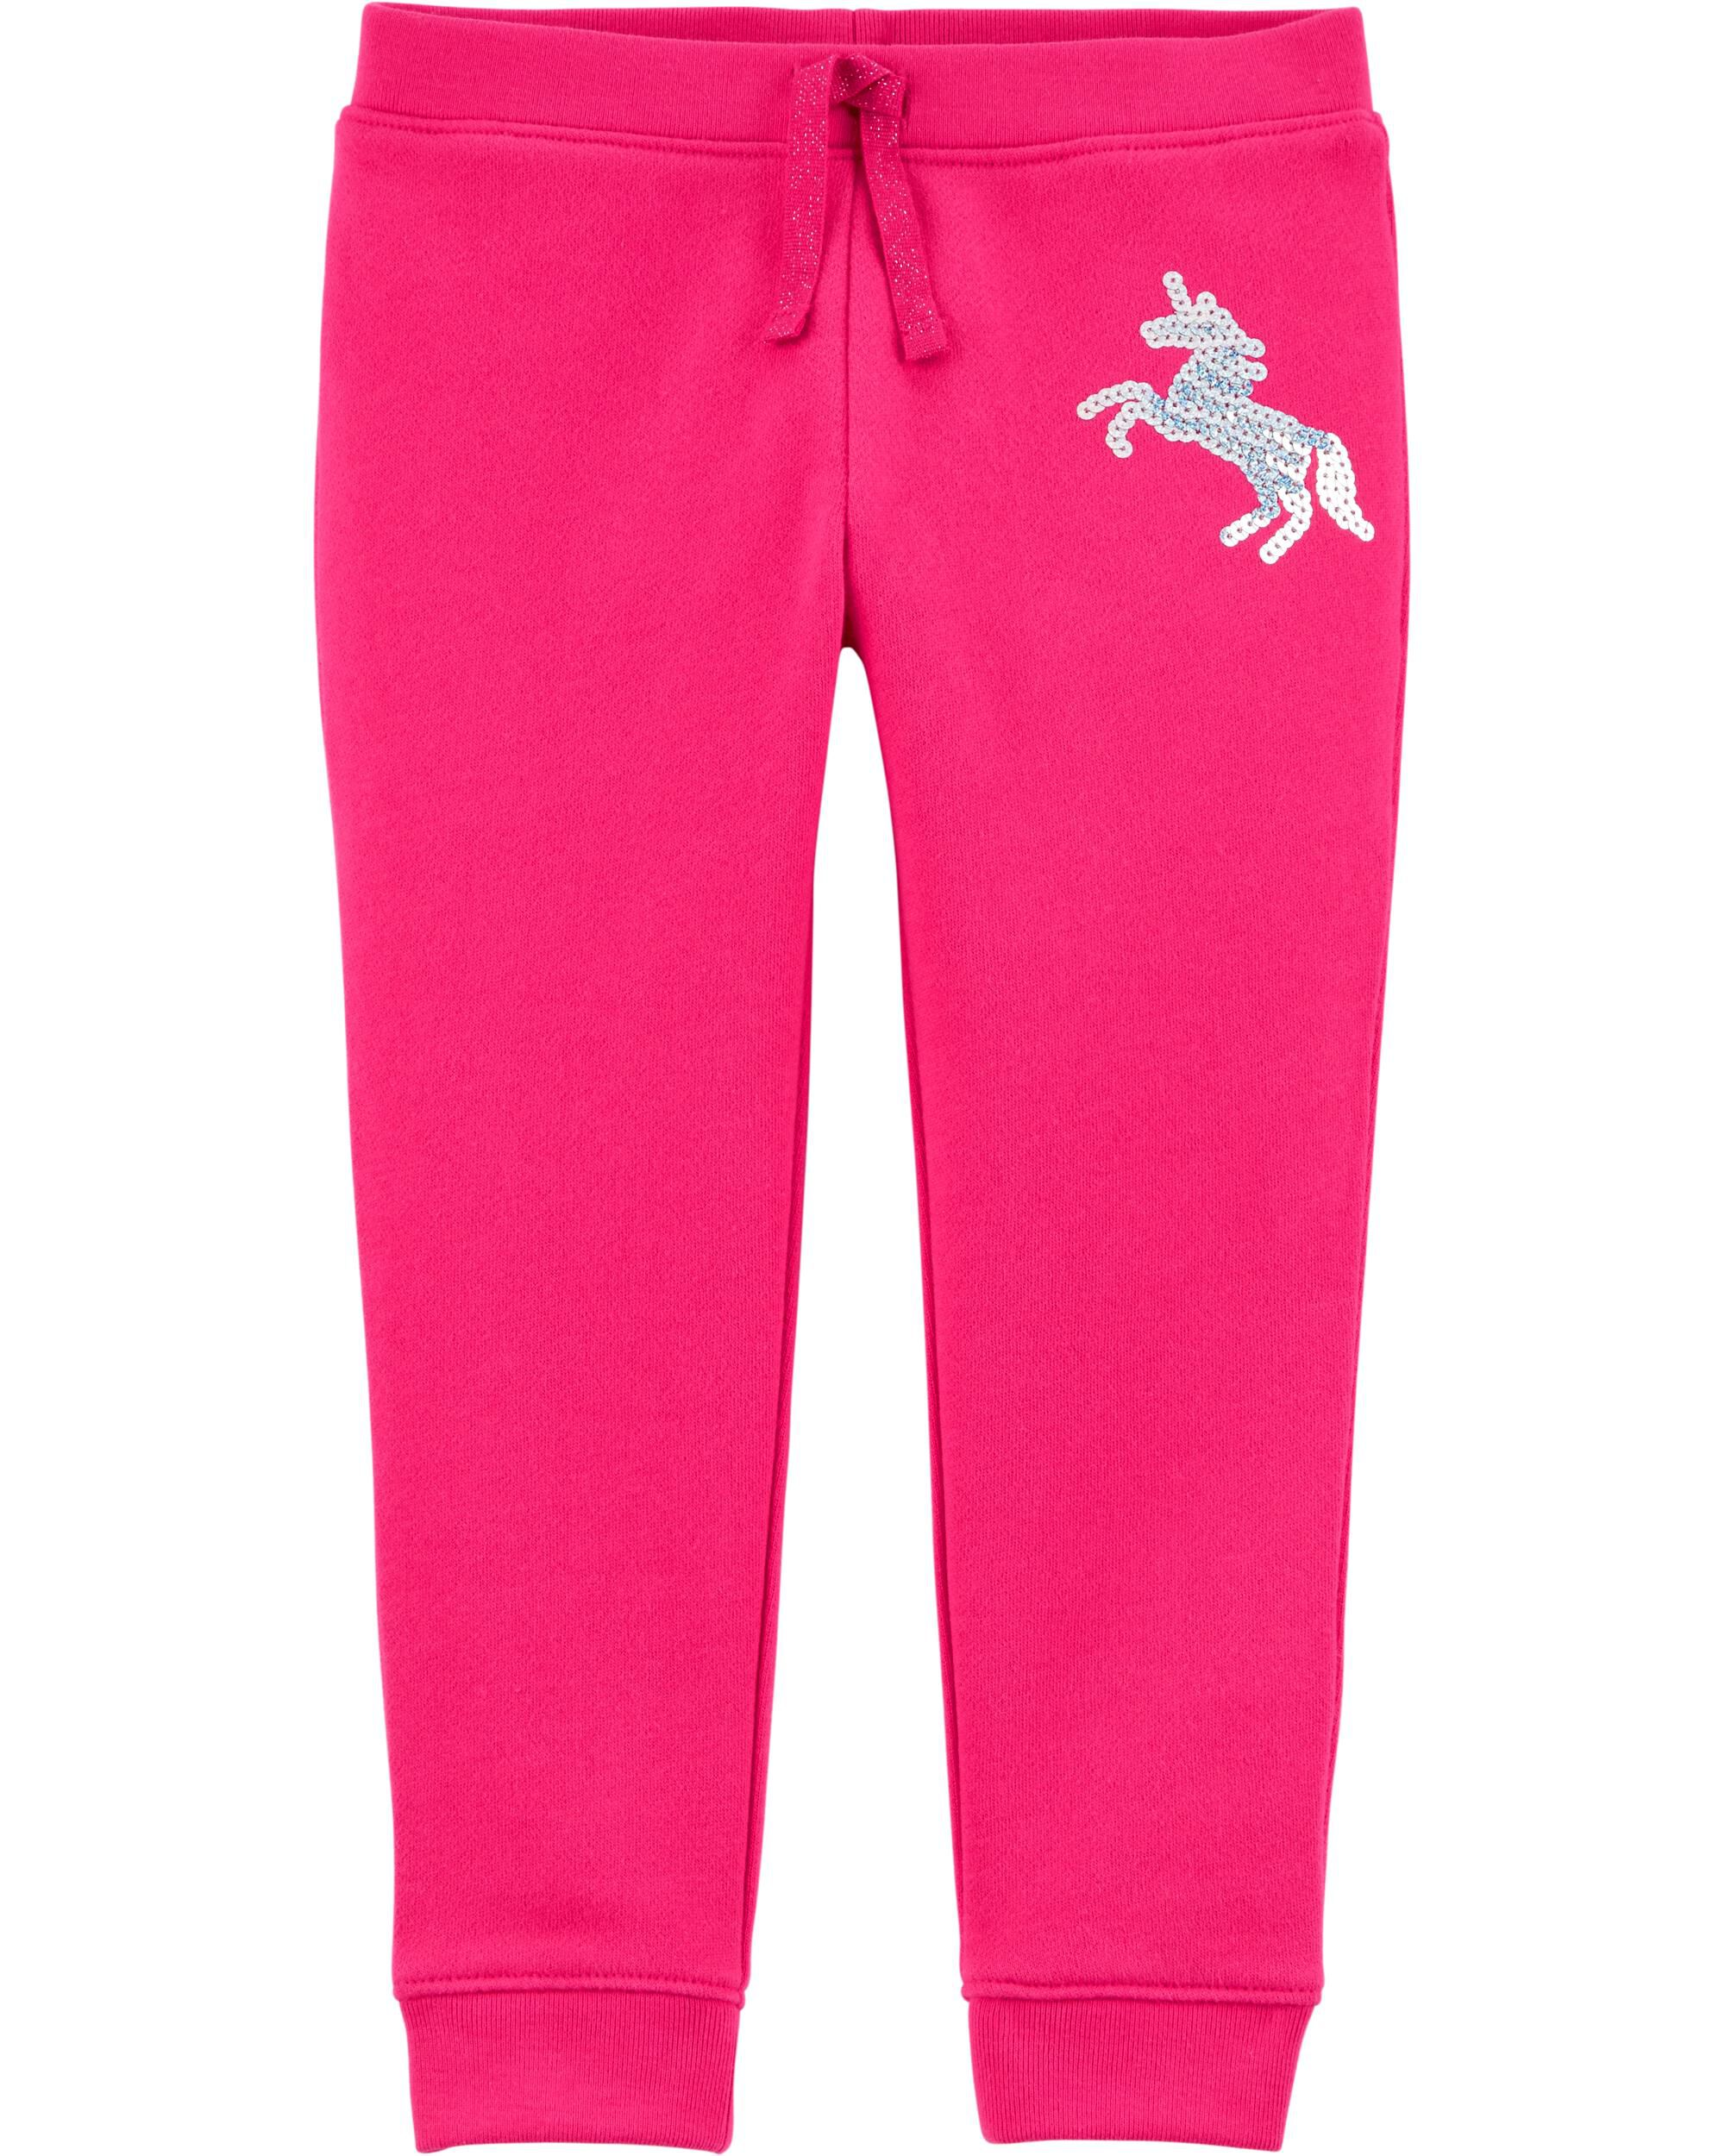 *CLEARANCE* Sequin Unicorn Pull-On Fleece Joggers